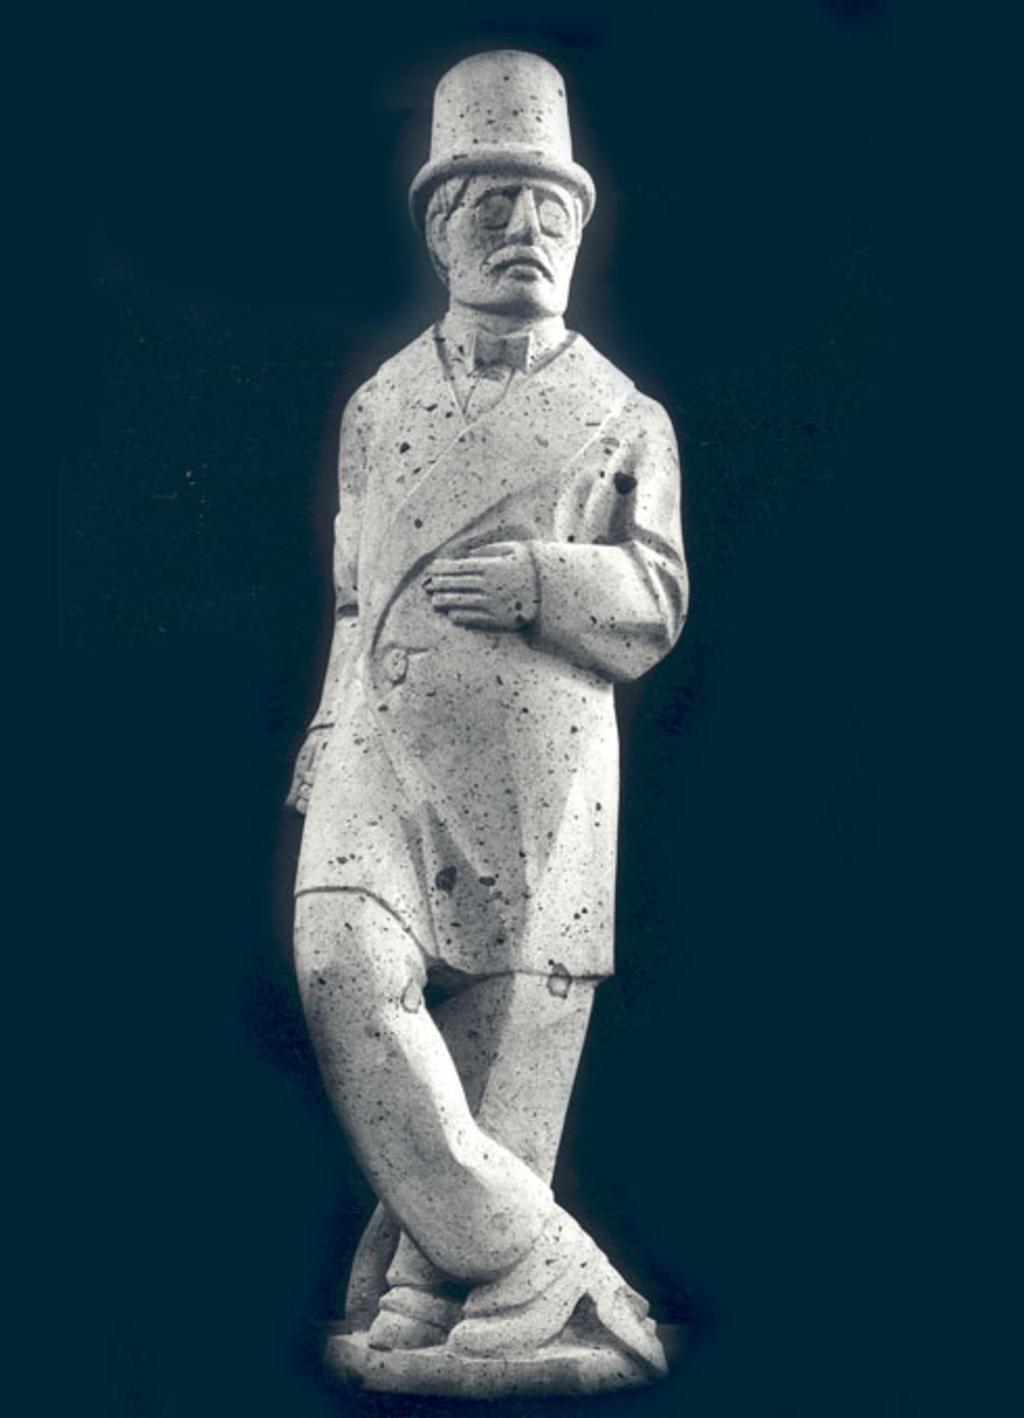 Jacques Offenbach Köln